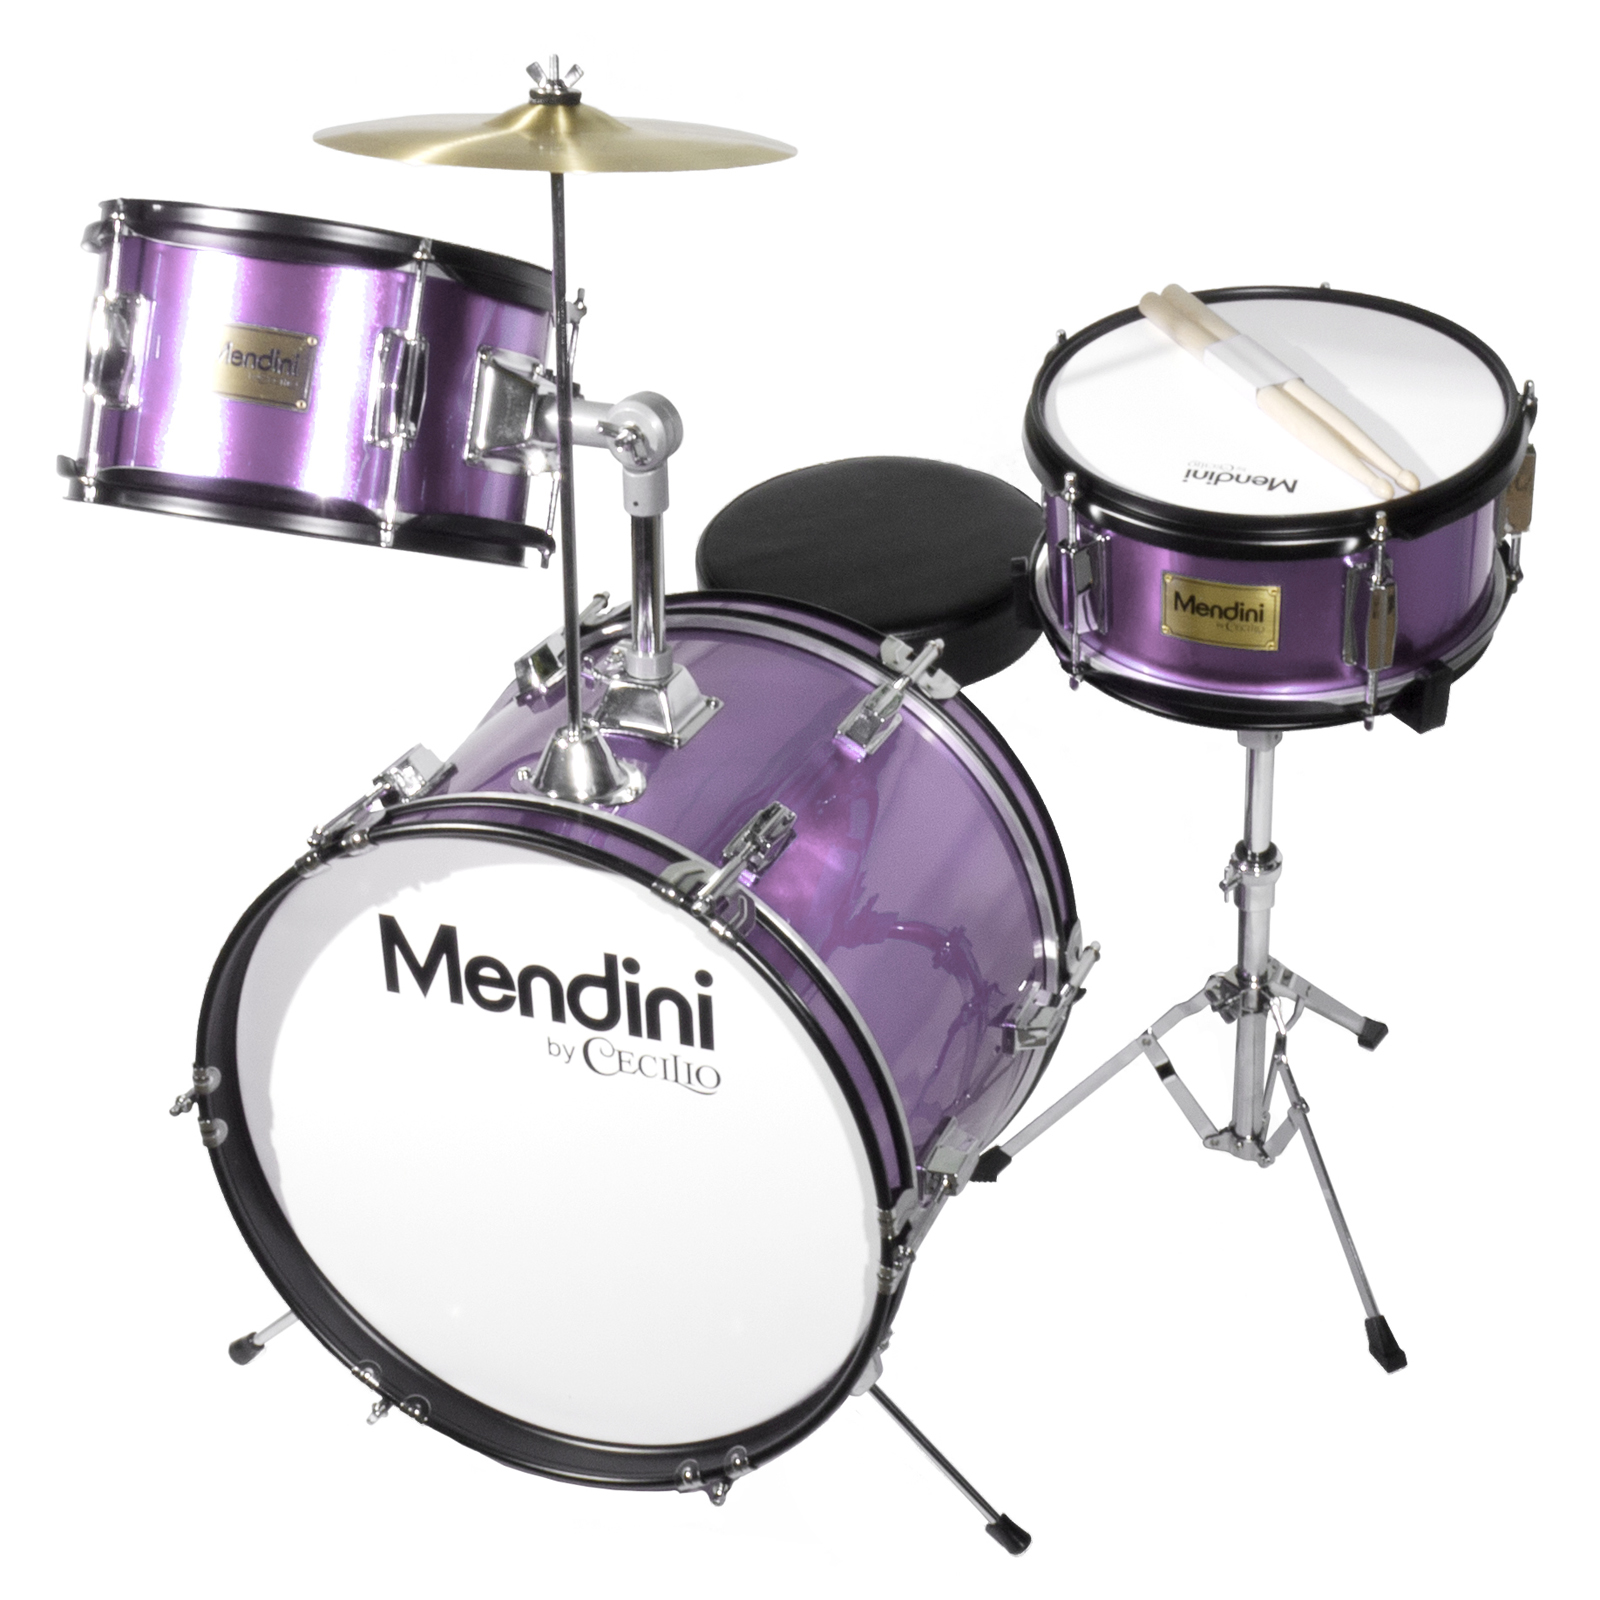 "Mendini by Cecilio 16"" 3-Piece Kids / Junior Drum Set with Adjustable Throne, Cymbal, Pedal & Drumsticks, Metallic Purple, MJDS-3-PL"